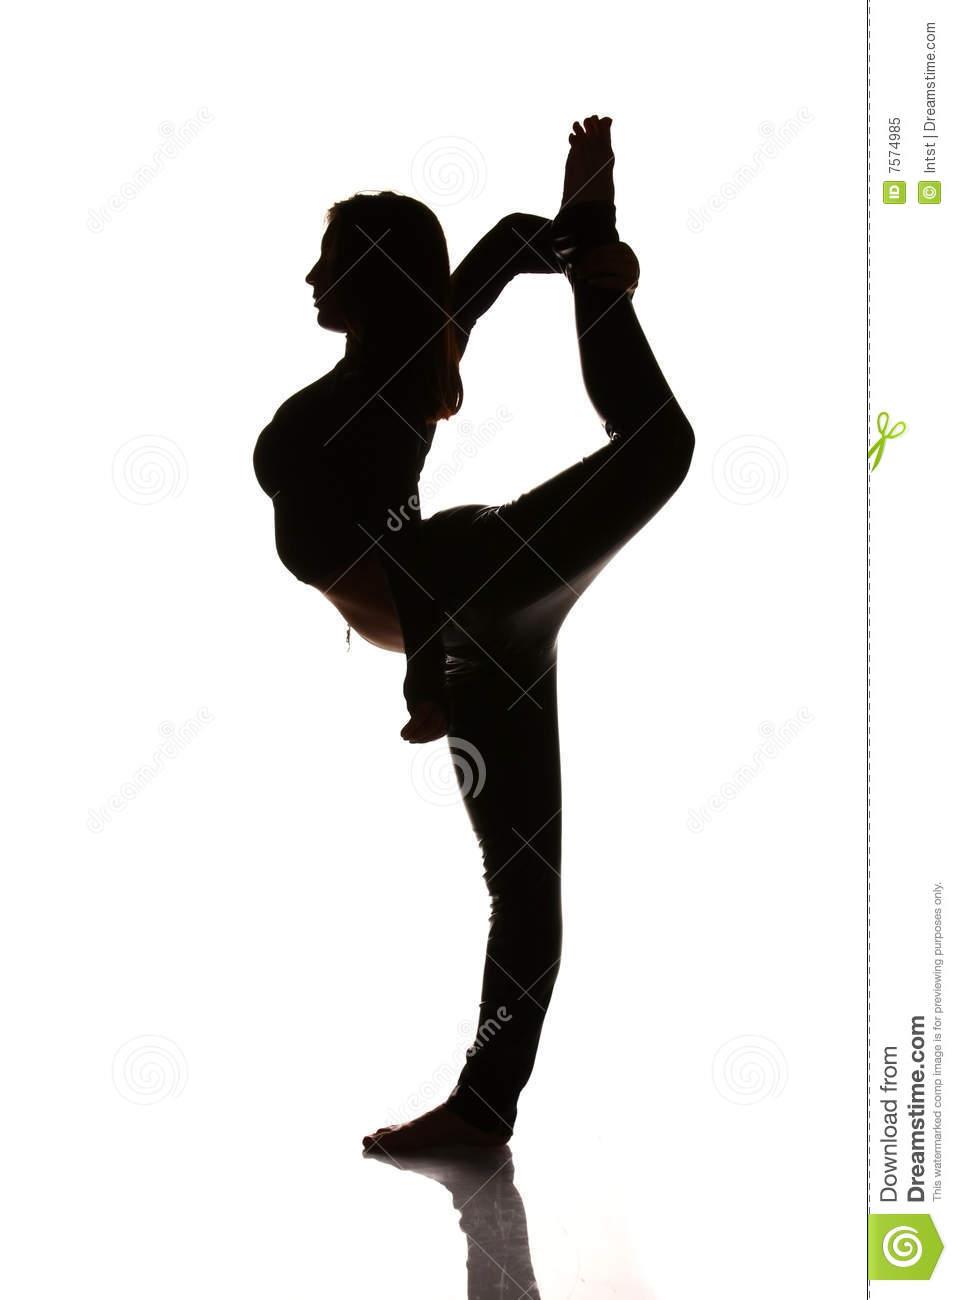 Ballet clipart flexibility Images Flexibility Free flexibility%20clipart Clipart